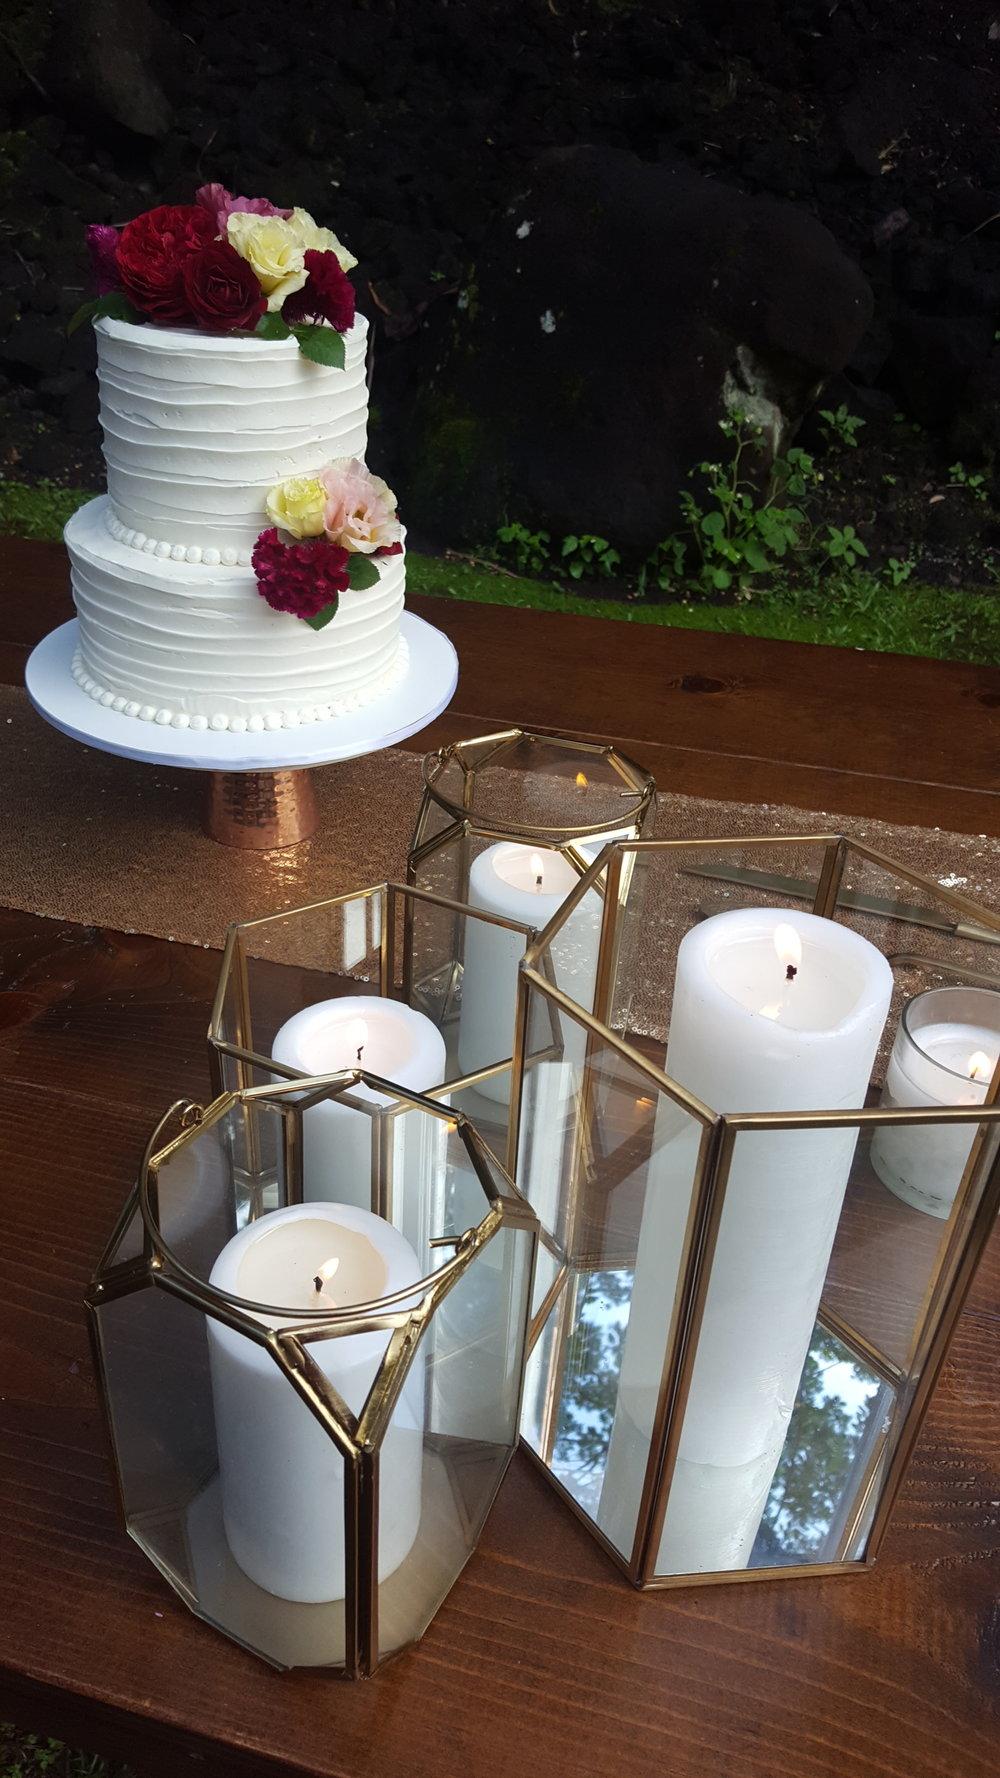 Two tier textured buttercream wedding cake with fresh flowers Hilo Hawaii Big Island Kailua Kona